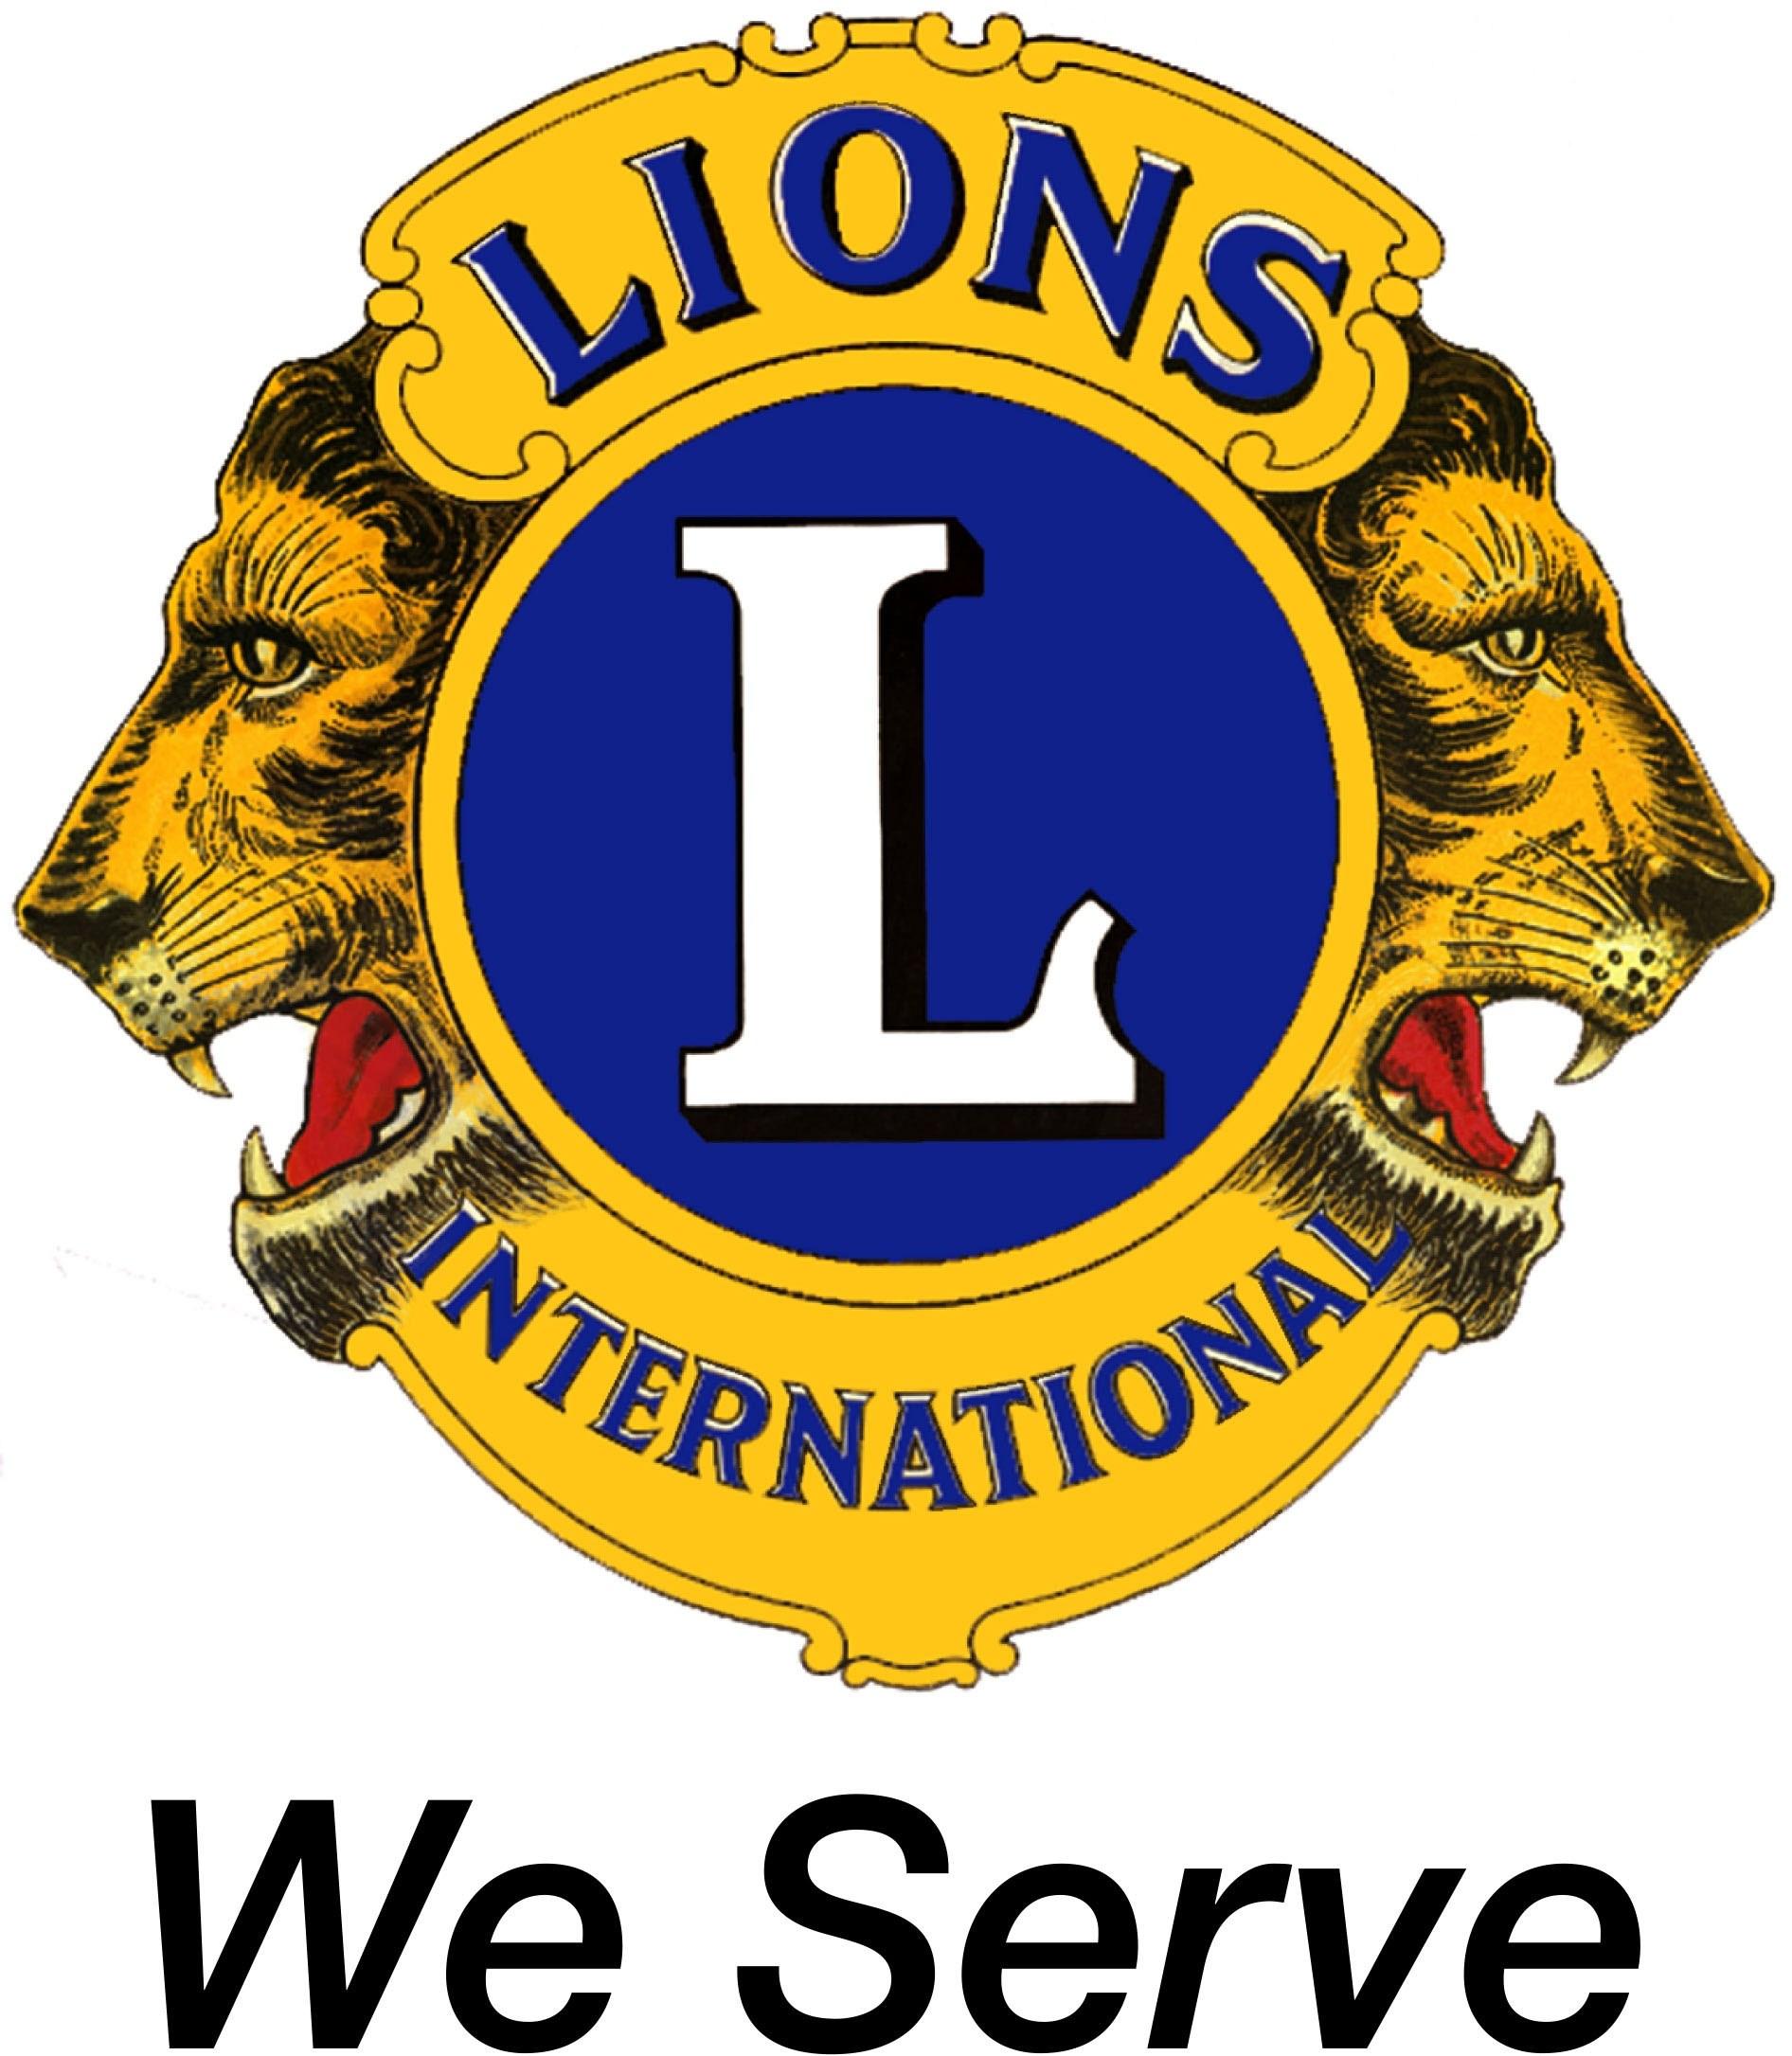 Lions club logo clipart 1 » Clipart Portal.